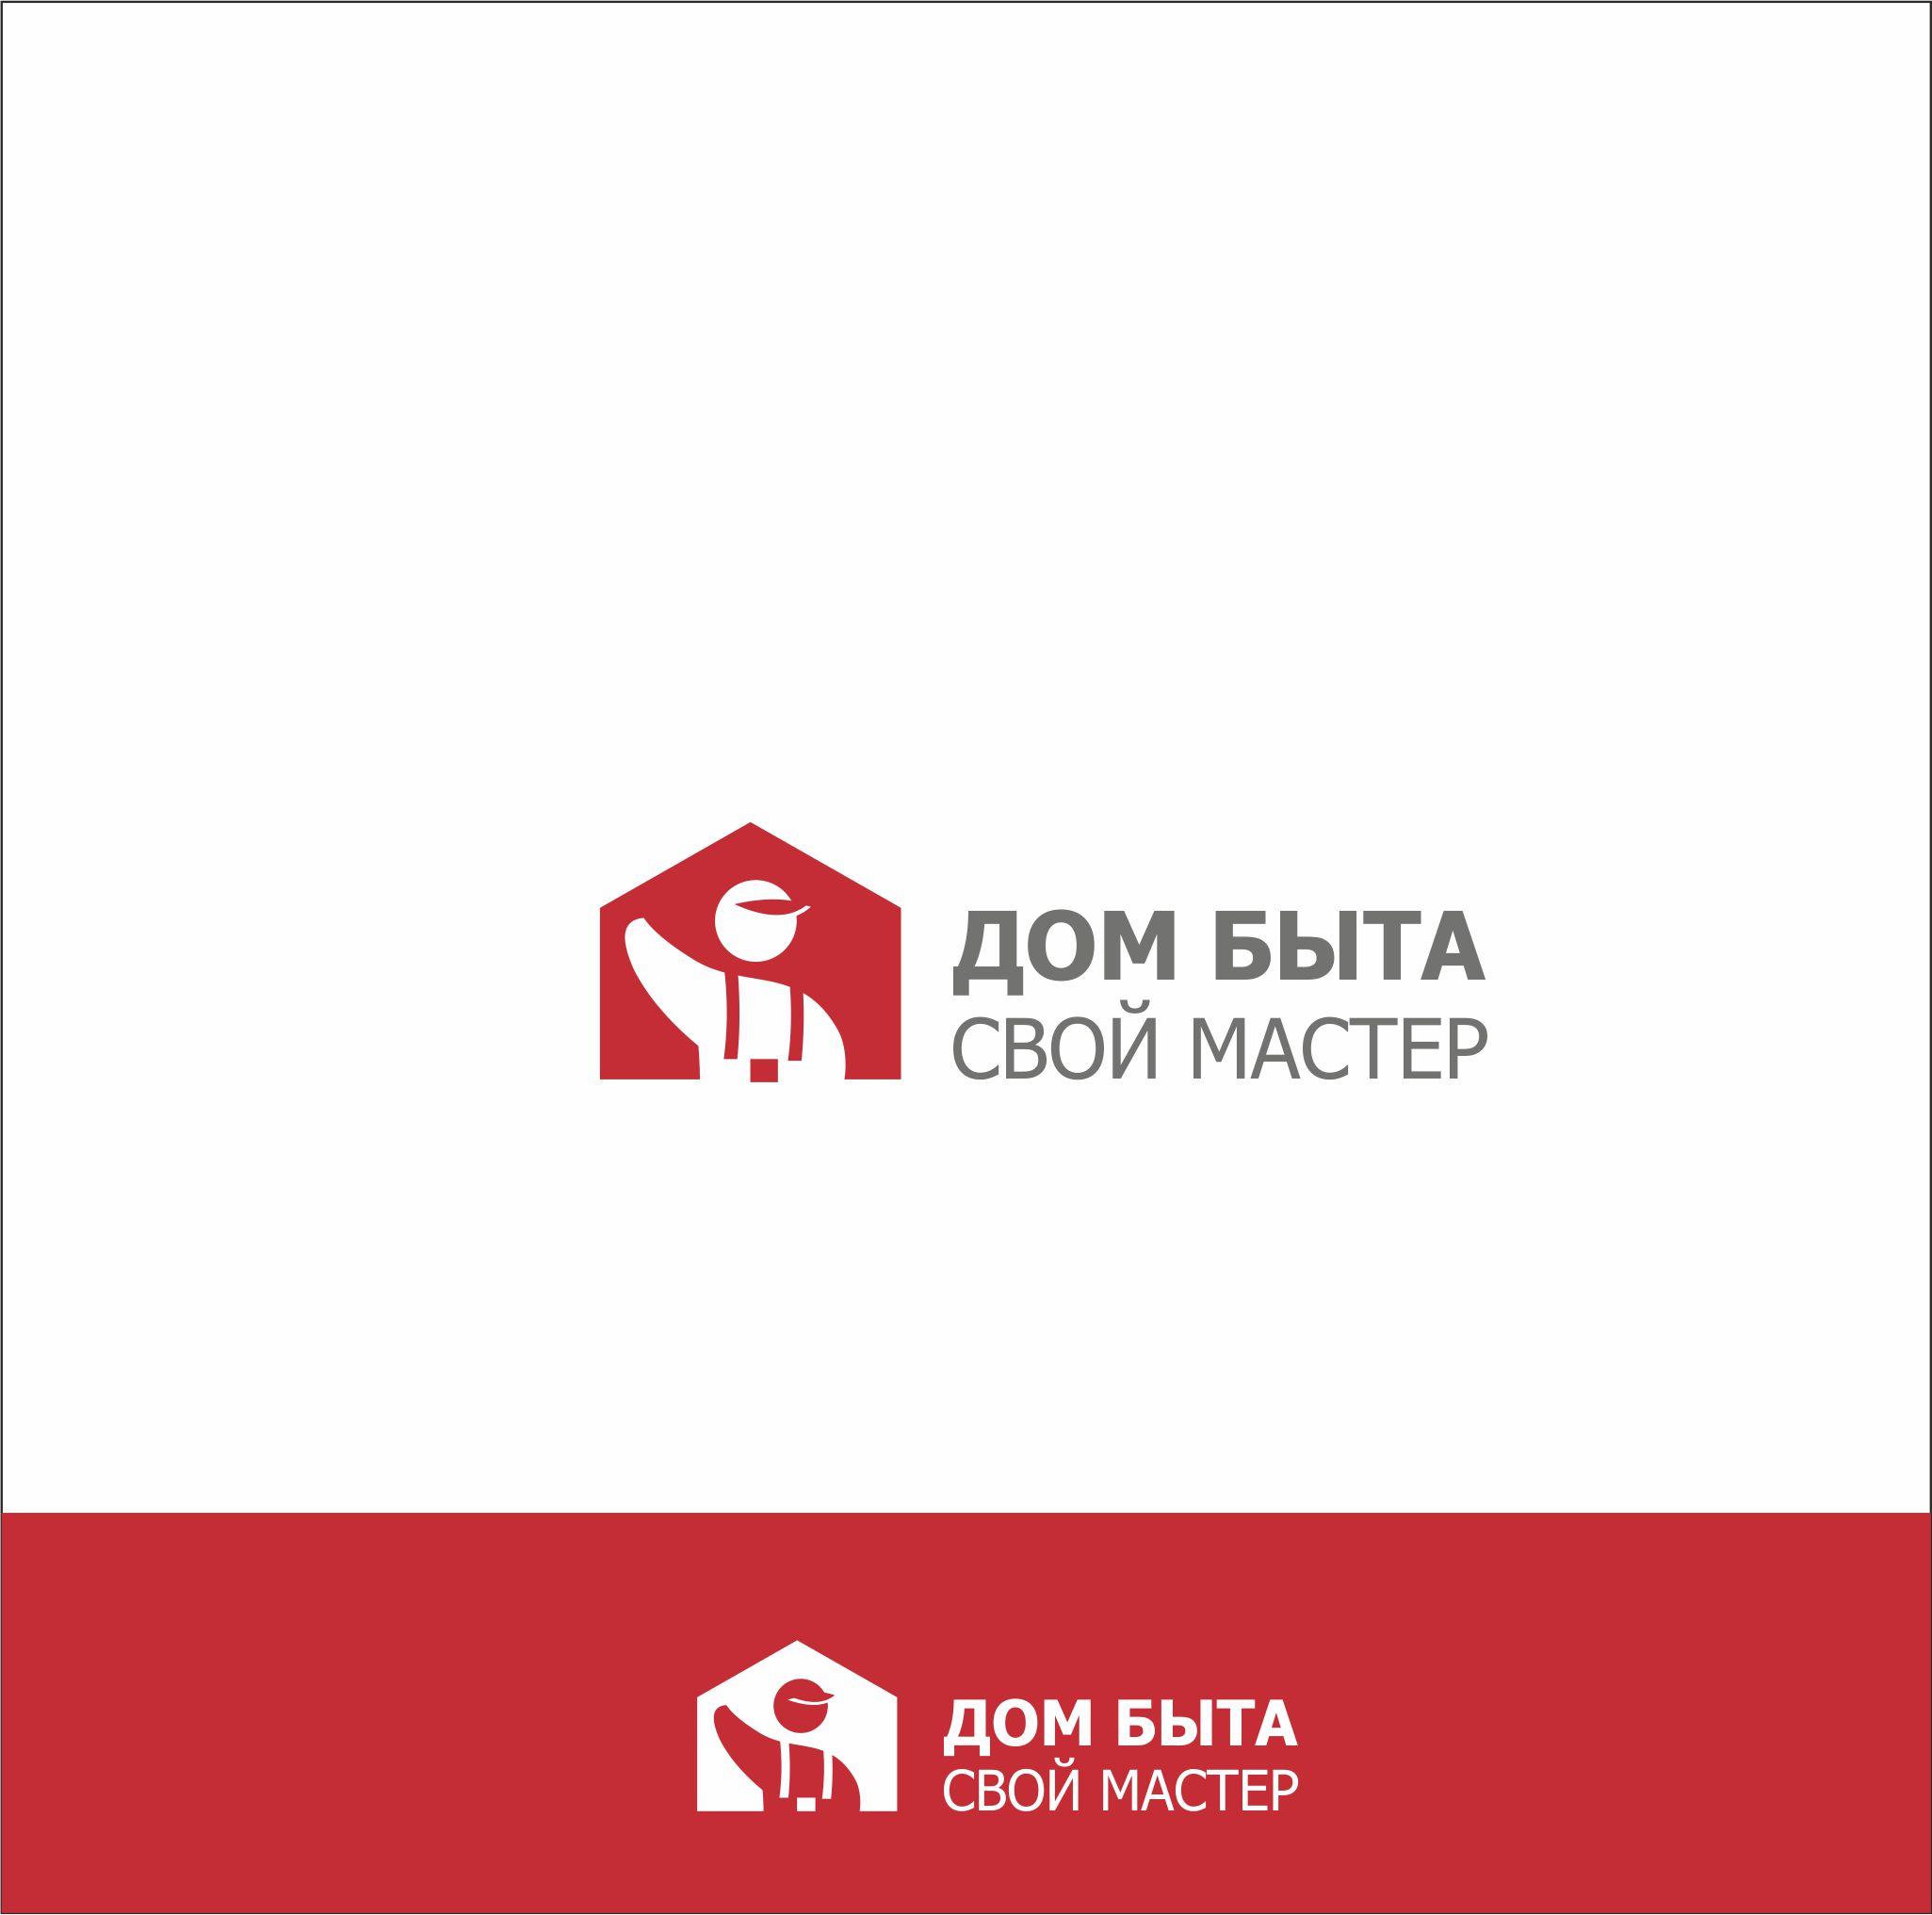 Логотип для сетевого ДОМ БЫТА фото f_6615d77375ac1fc7.jpg